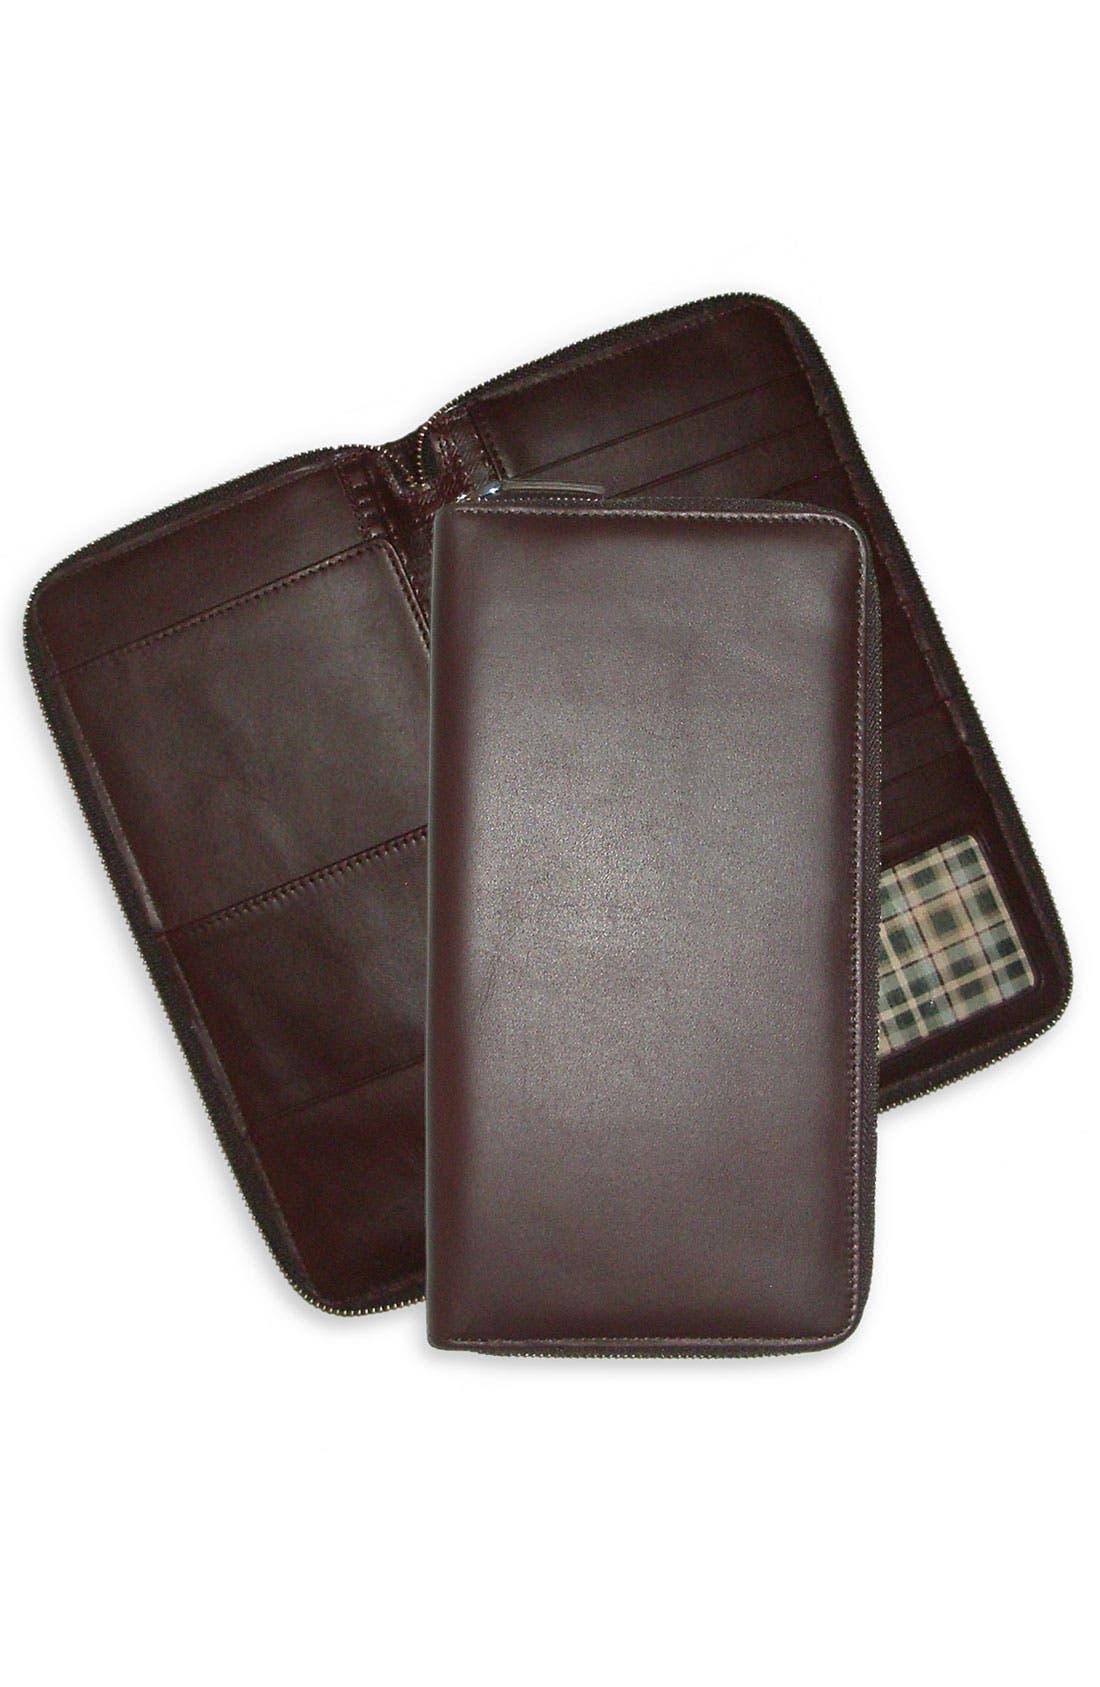 Main Image - Boconi Leather Traveler Wallet